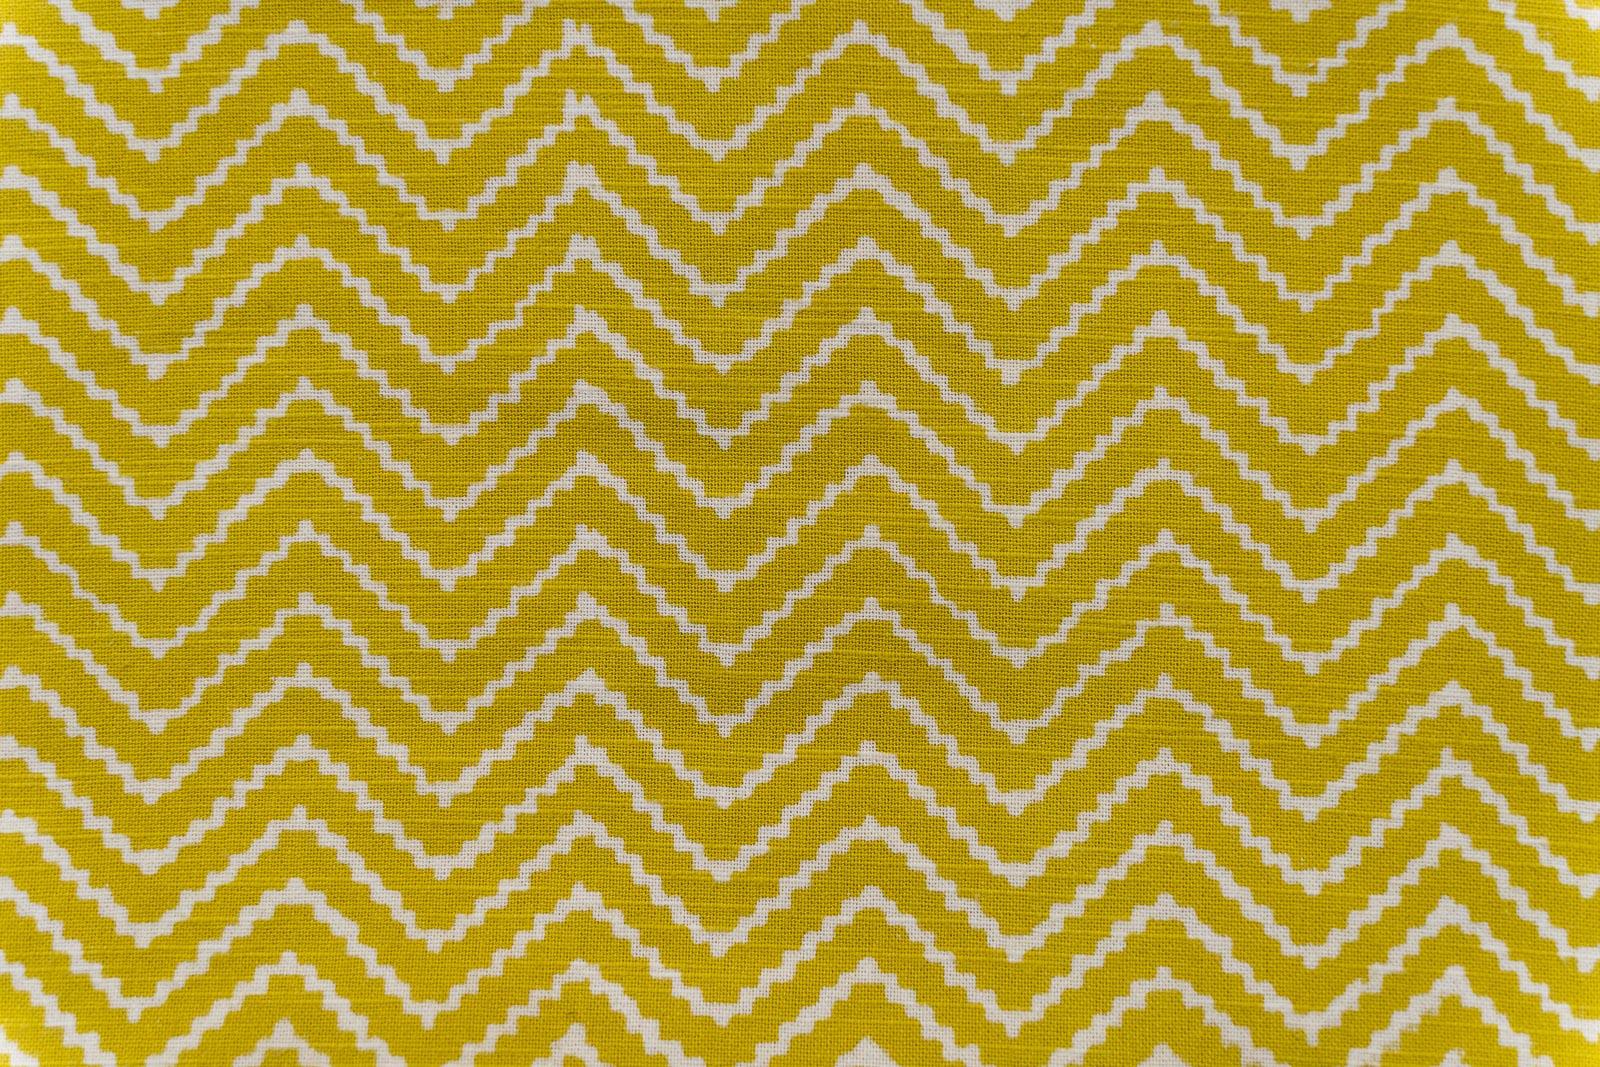 Mustard Block Print Upholstery Cotton Fabric